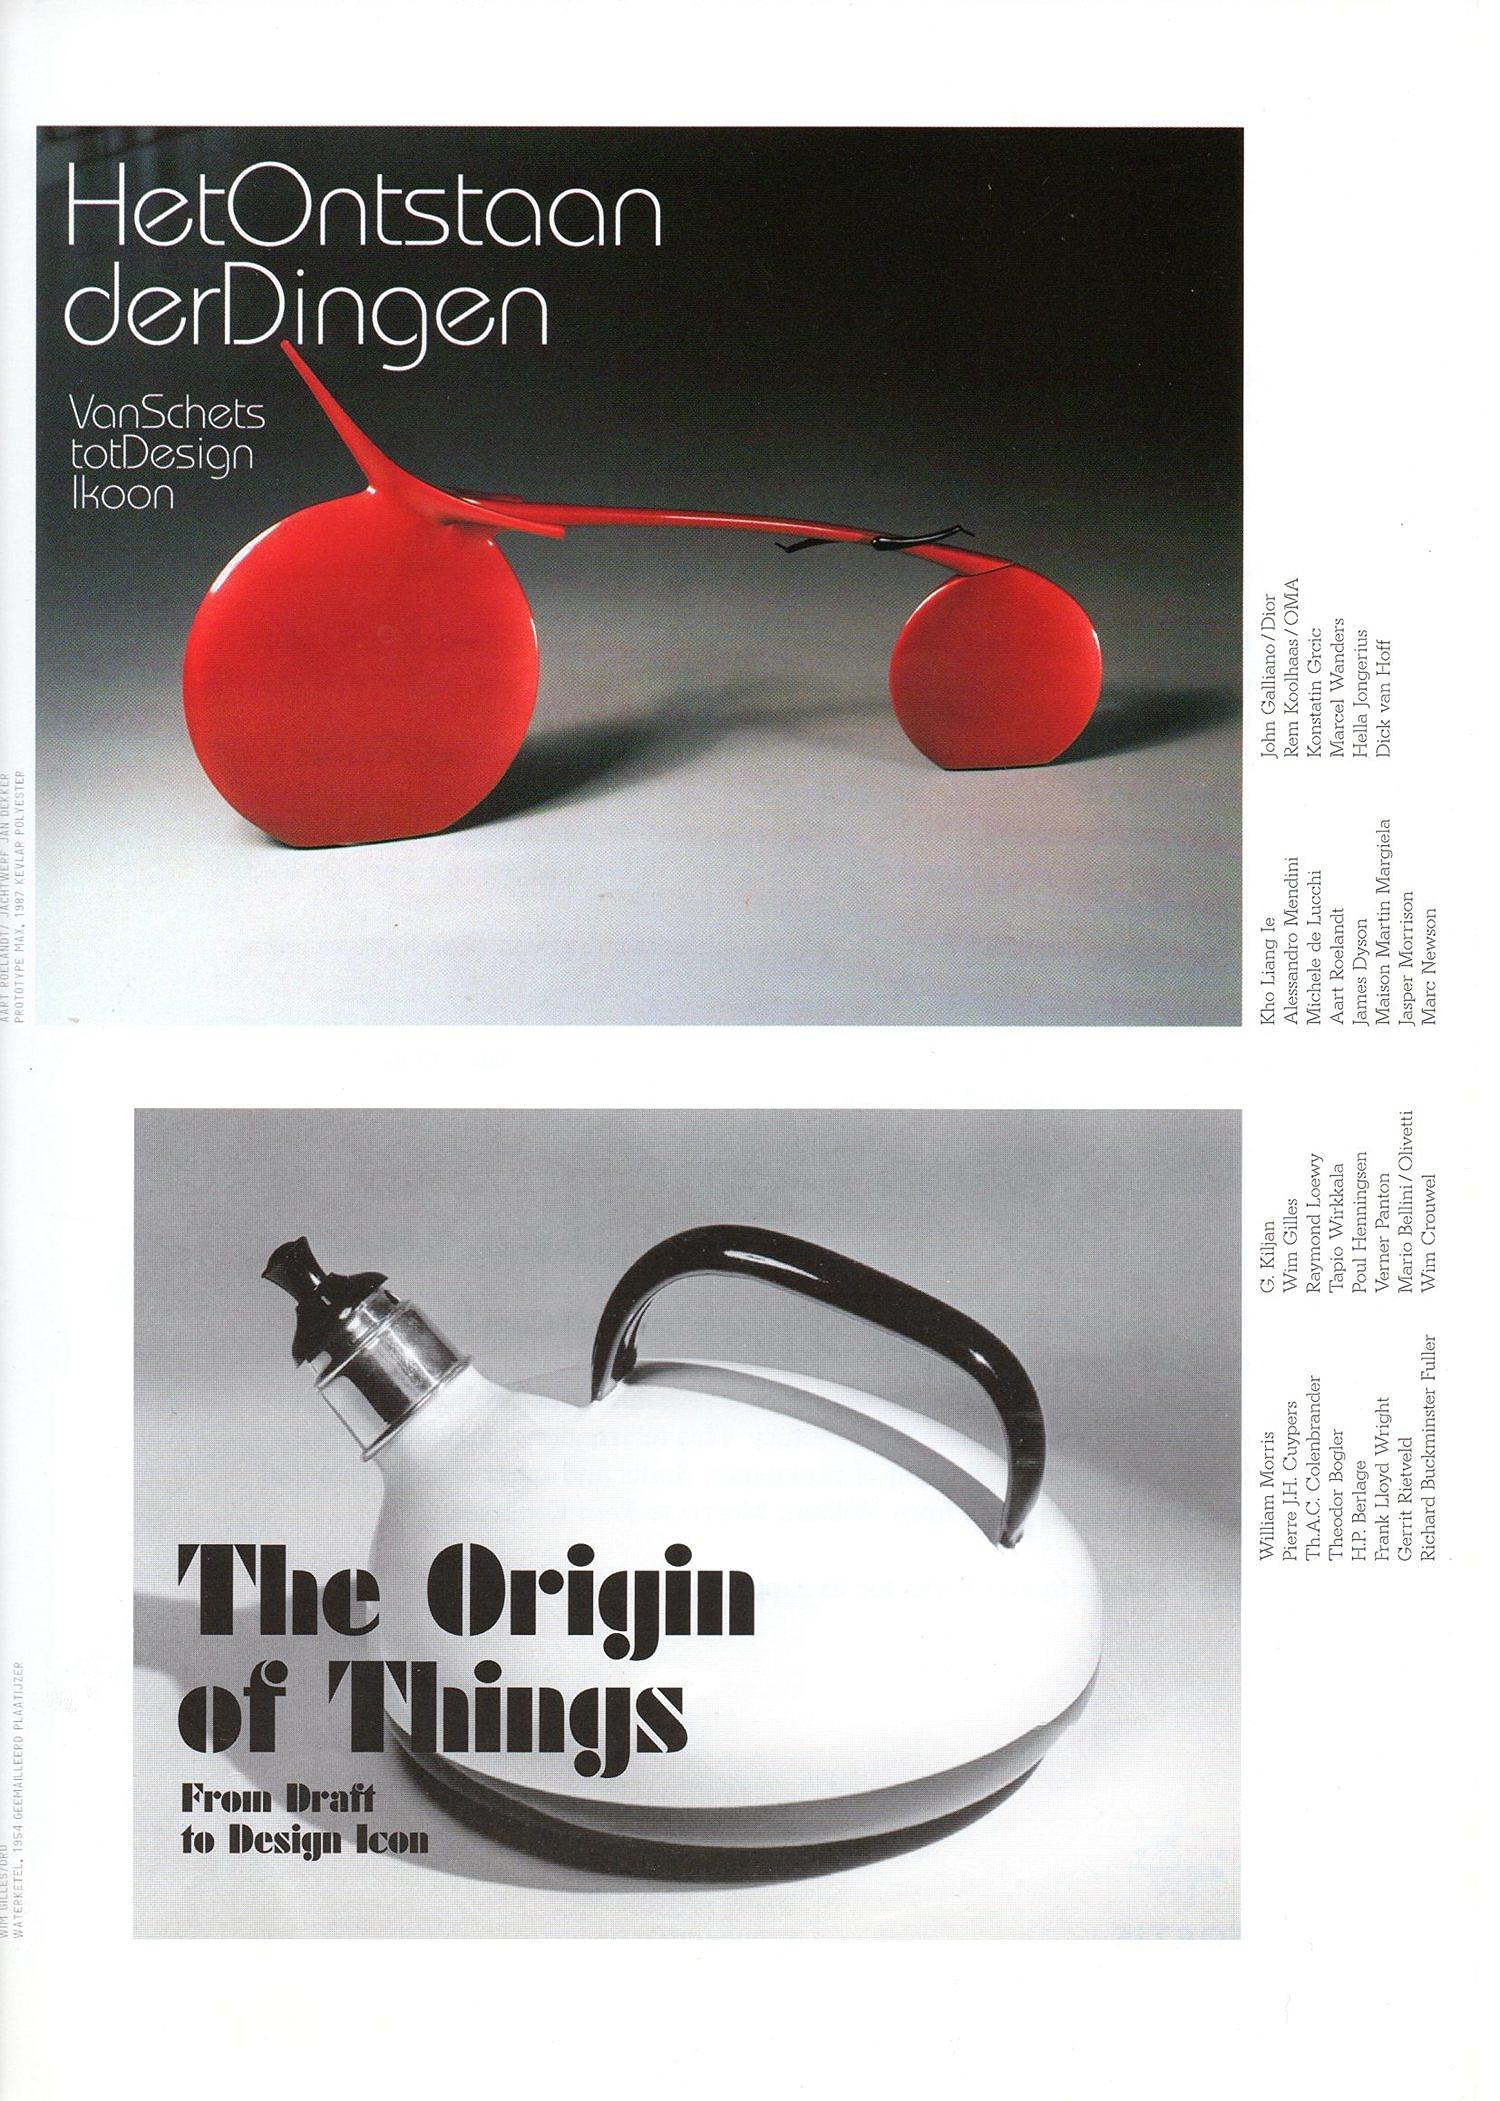 The origin of things (from draft to design icon) museum Boijmans Van Beuningen, Rotterdam 2003